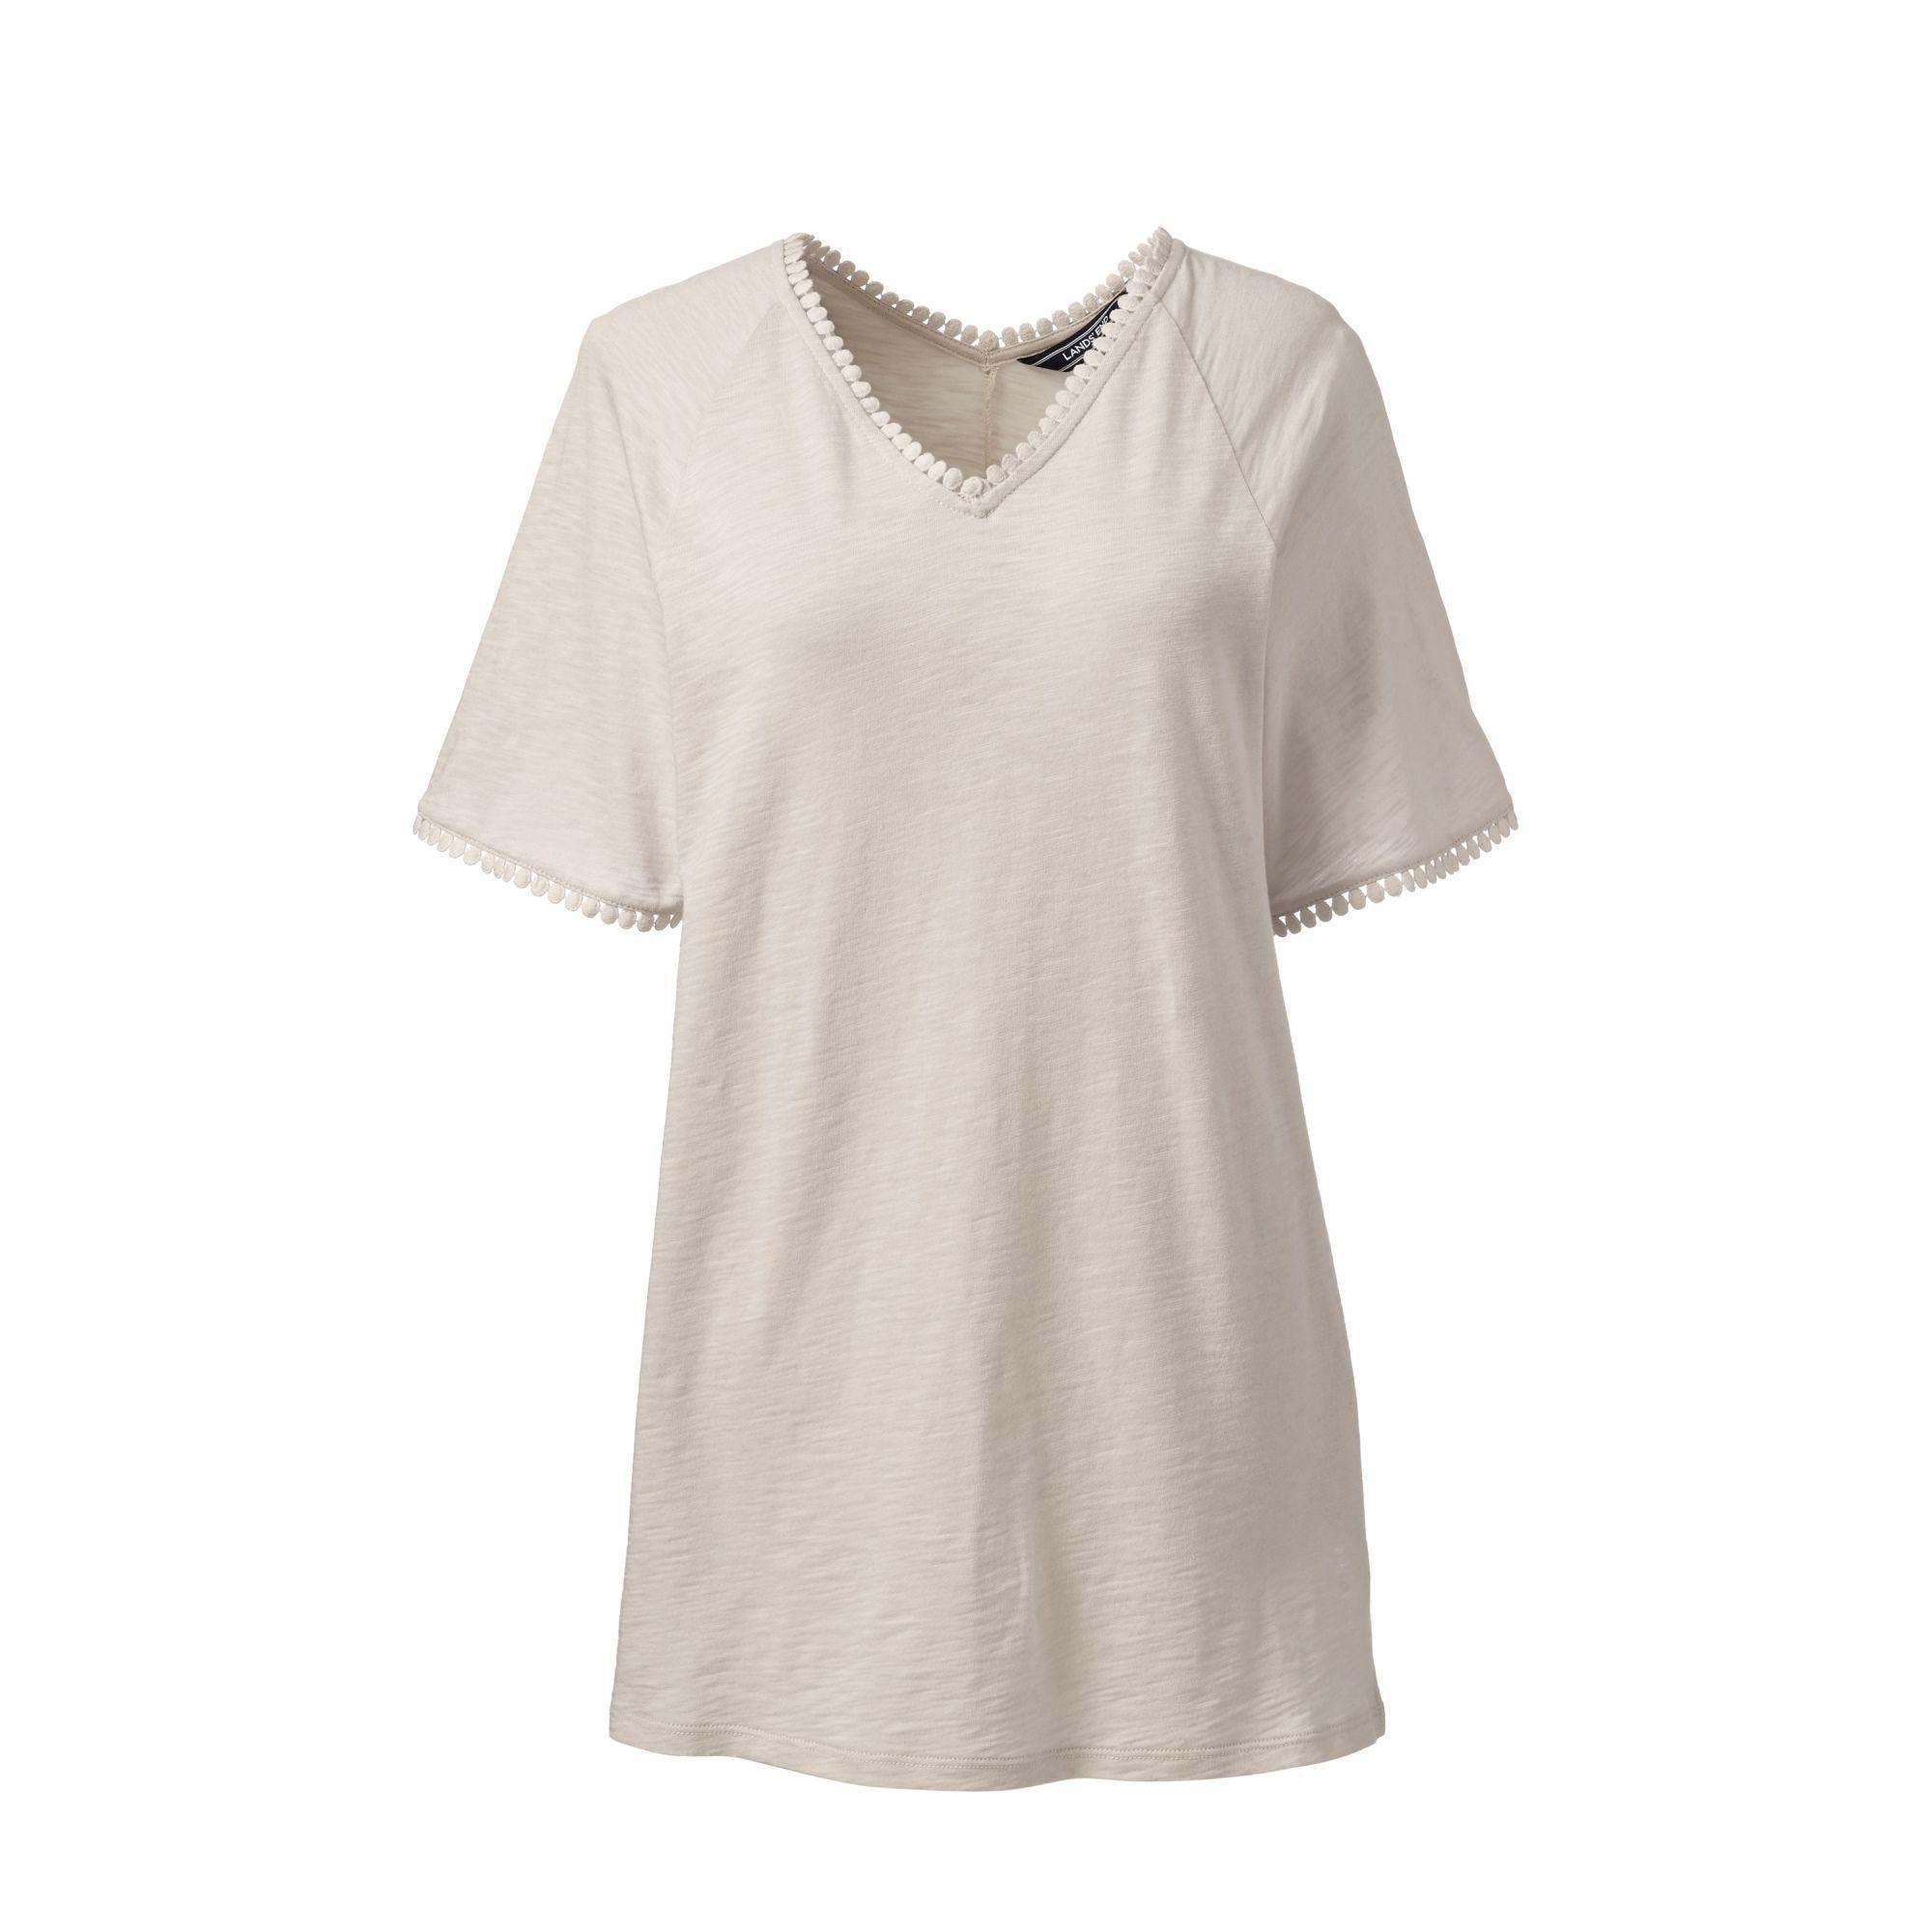 e4b3df01d70 Lands' End. Women's Natural Cream Petite Short Sleeve Tunic Top In Cotton &  Modal